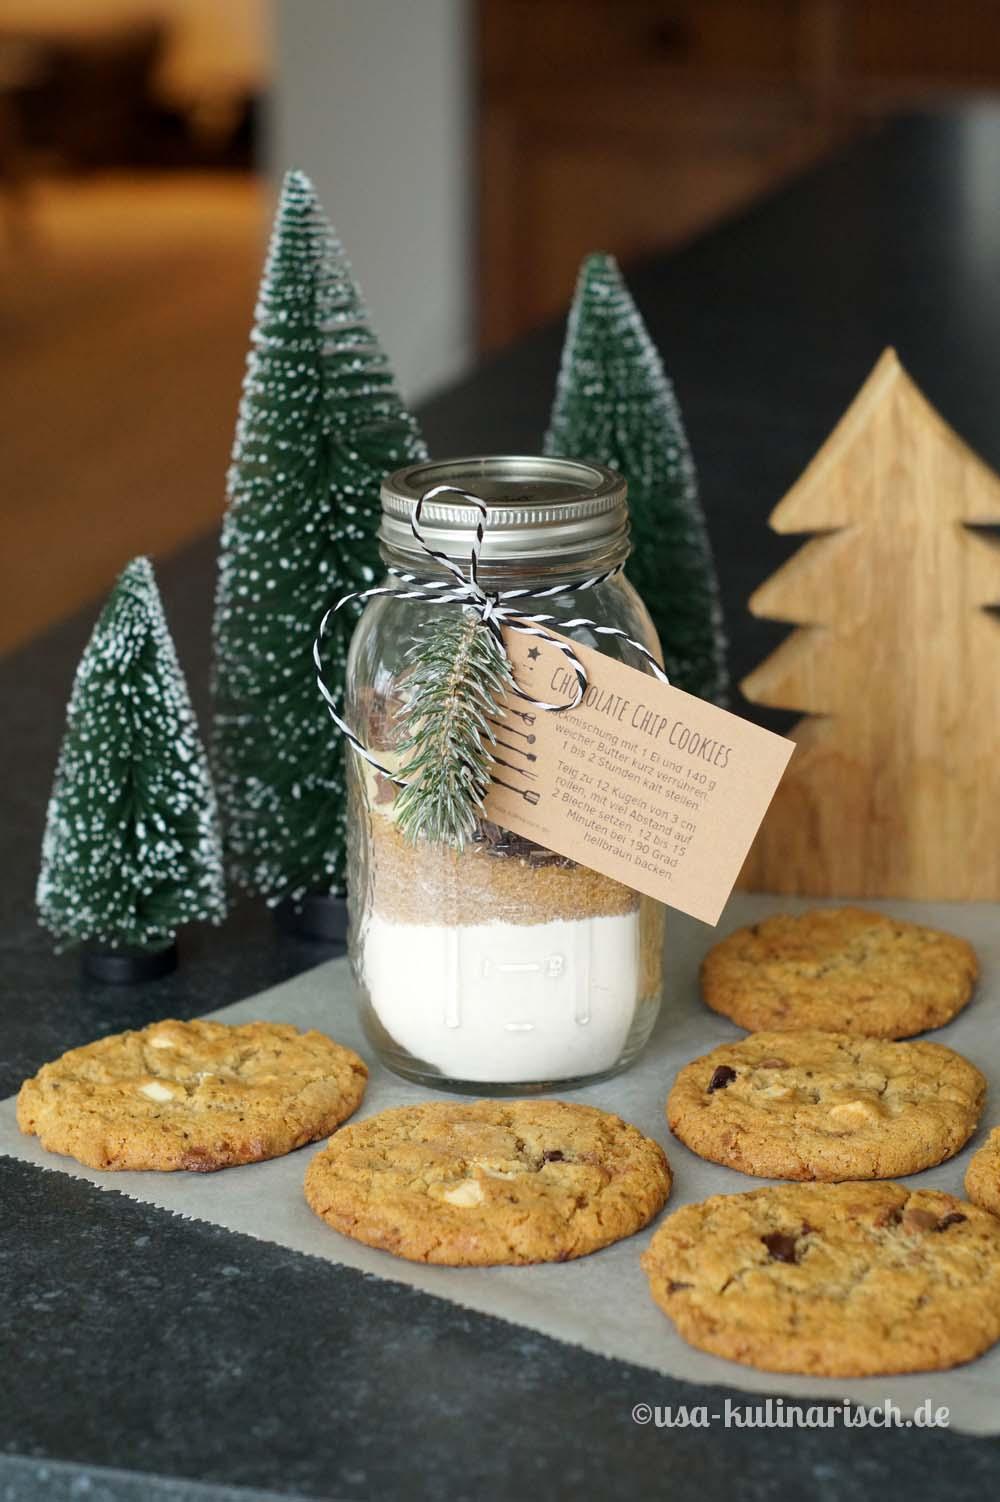 Cookiemix und fertige Kekse